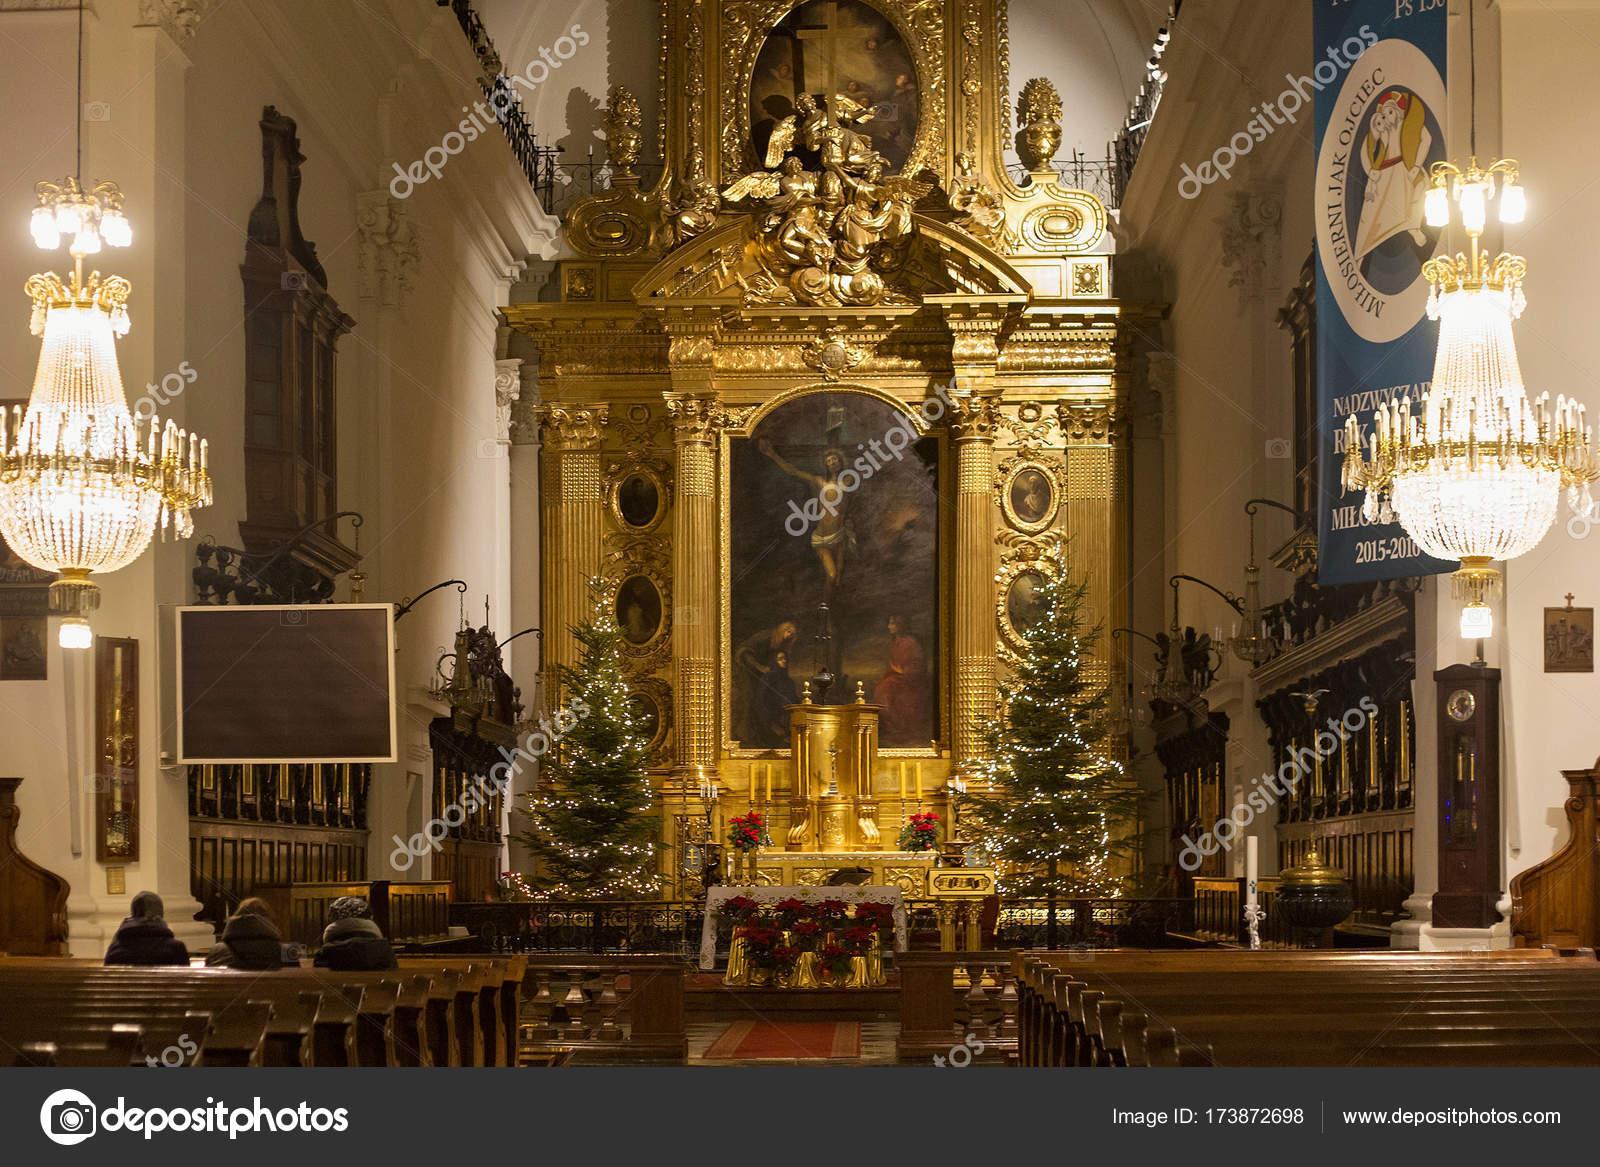 interior of the roman catholic church of the holy cross xv xvi cent